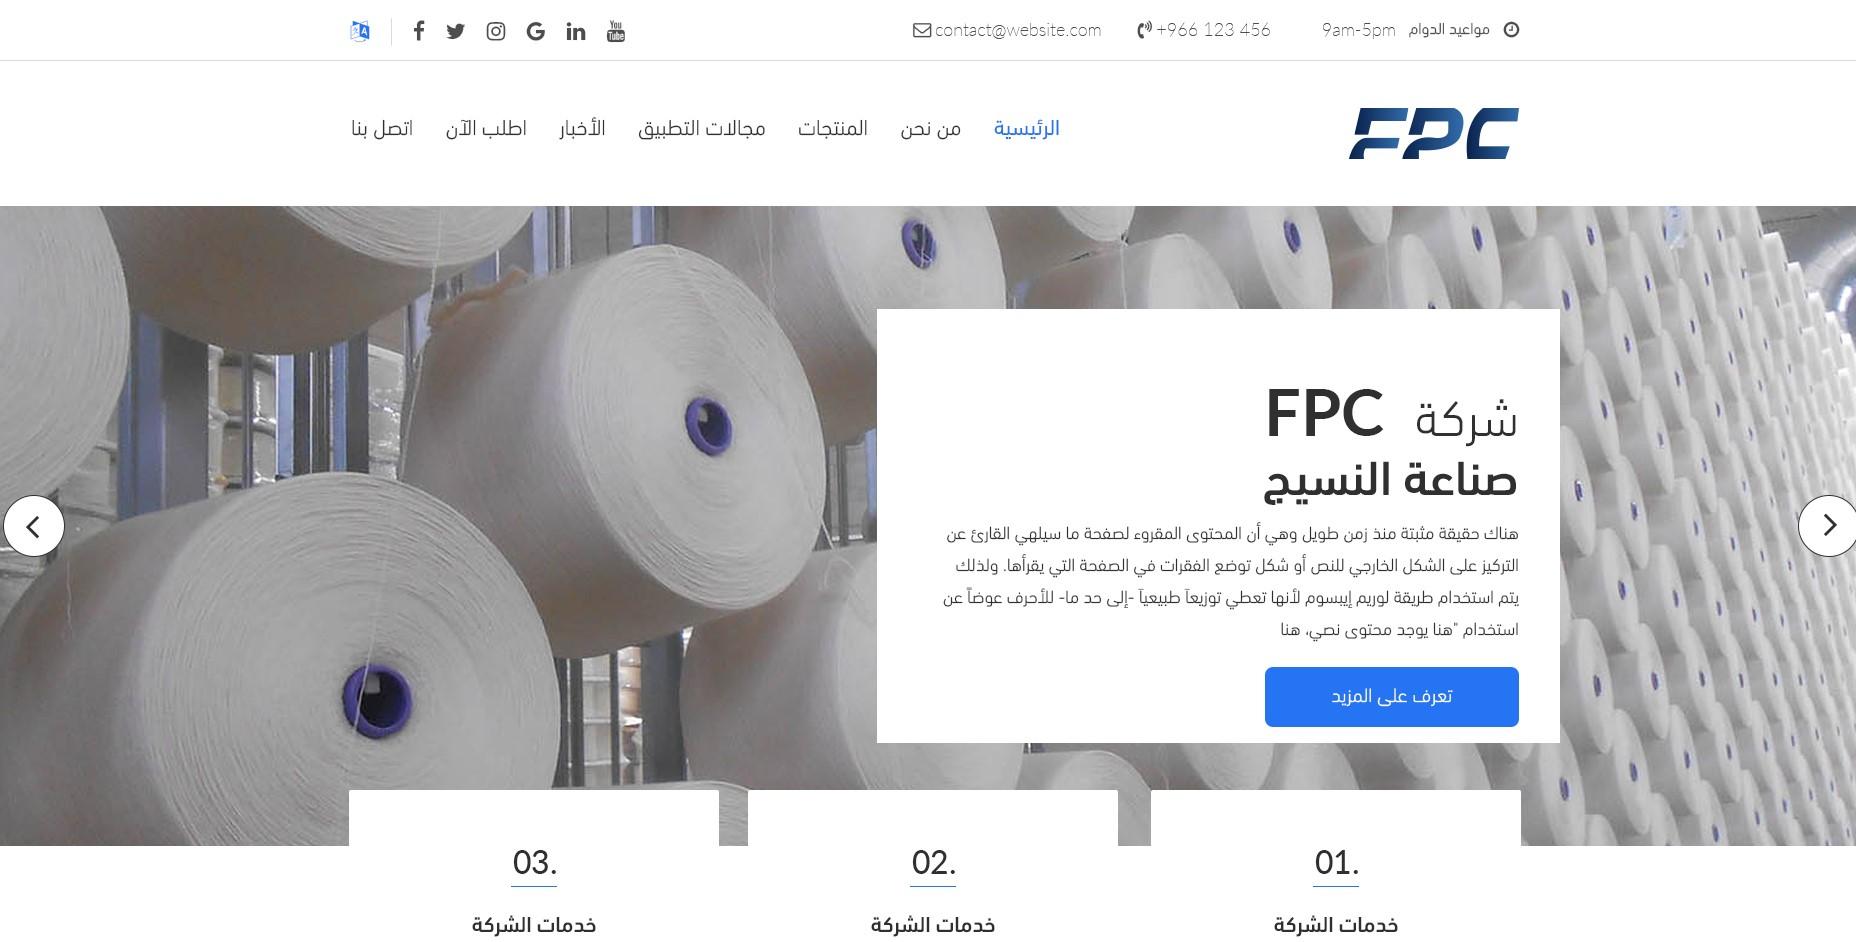 FPC website